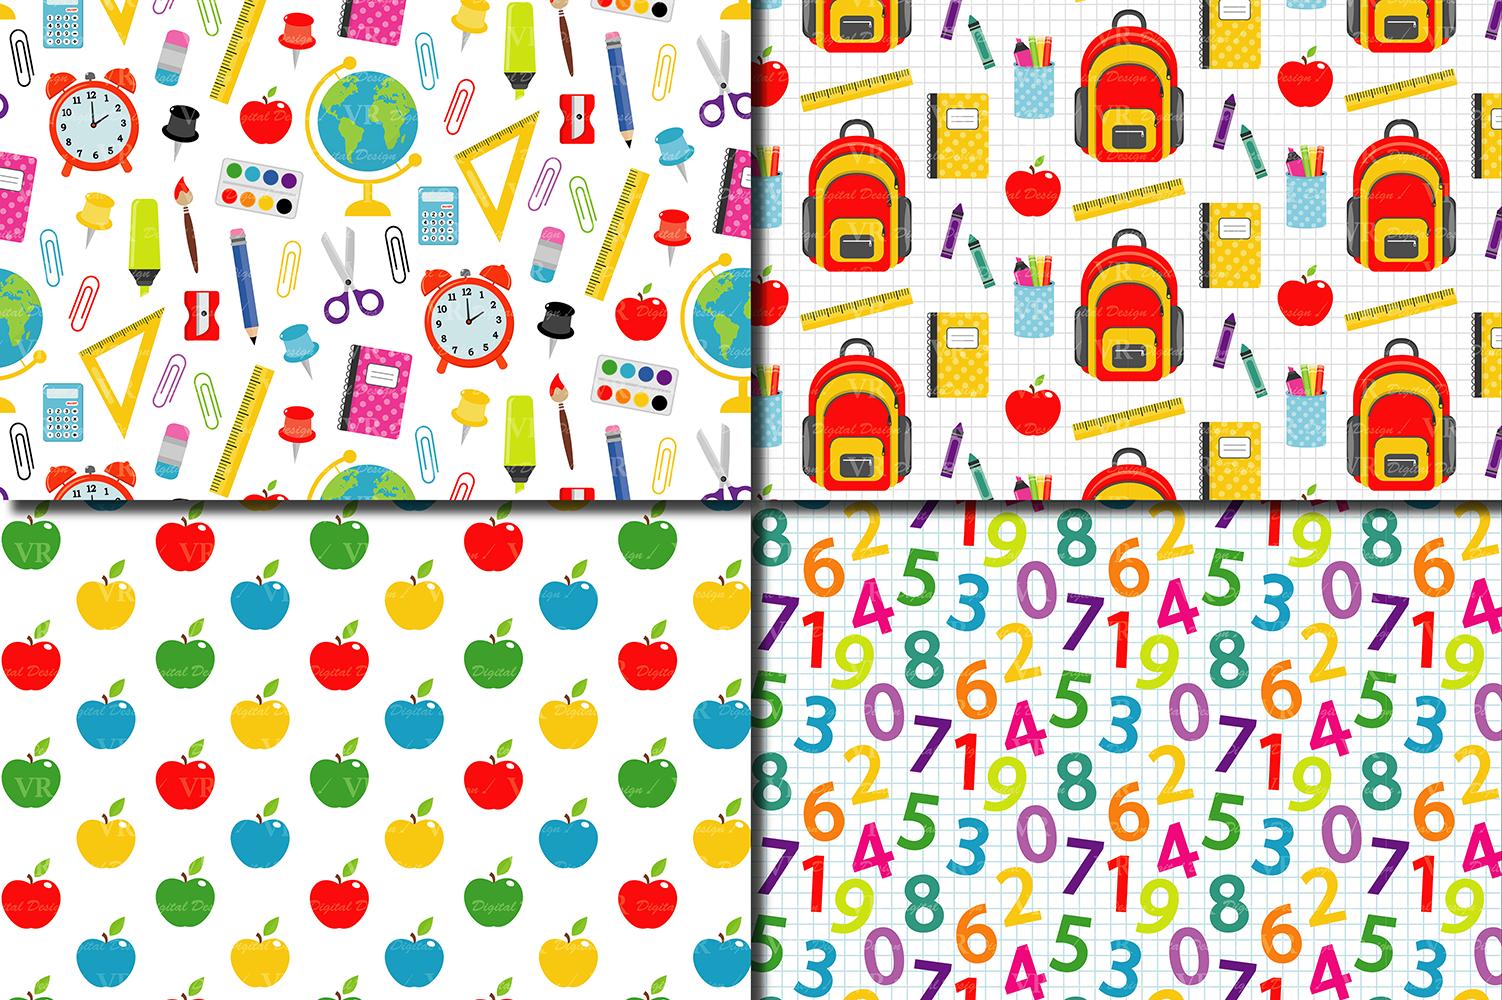 Back to School Digital paper / School Supplies pattern / School Background / Teacher Printable paper example image 2